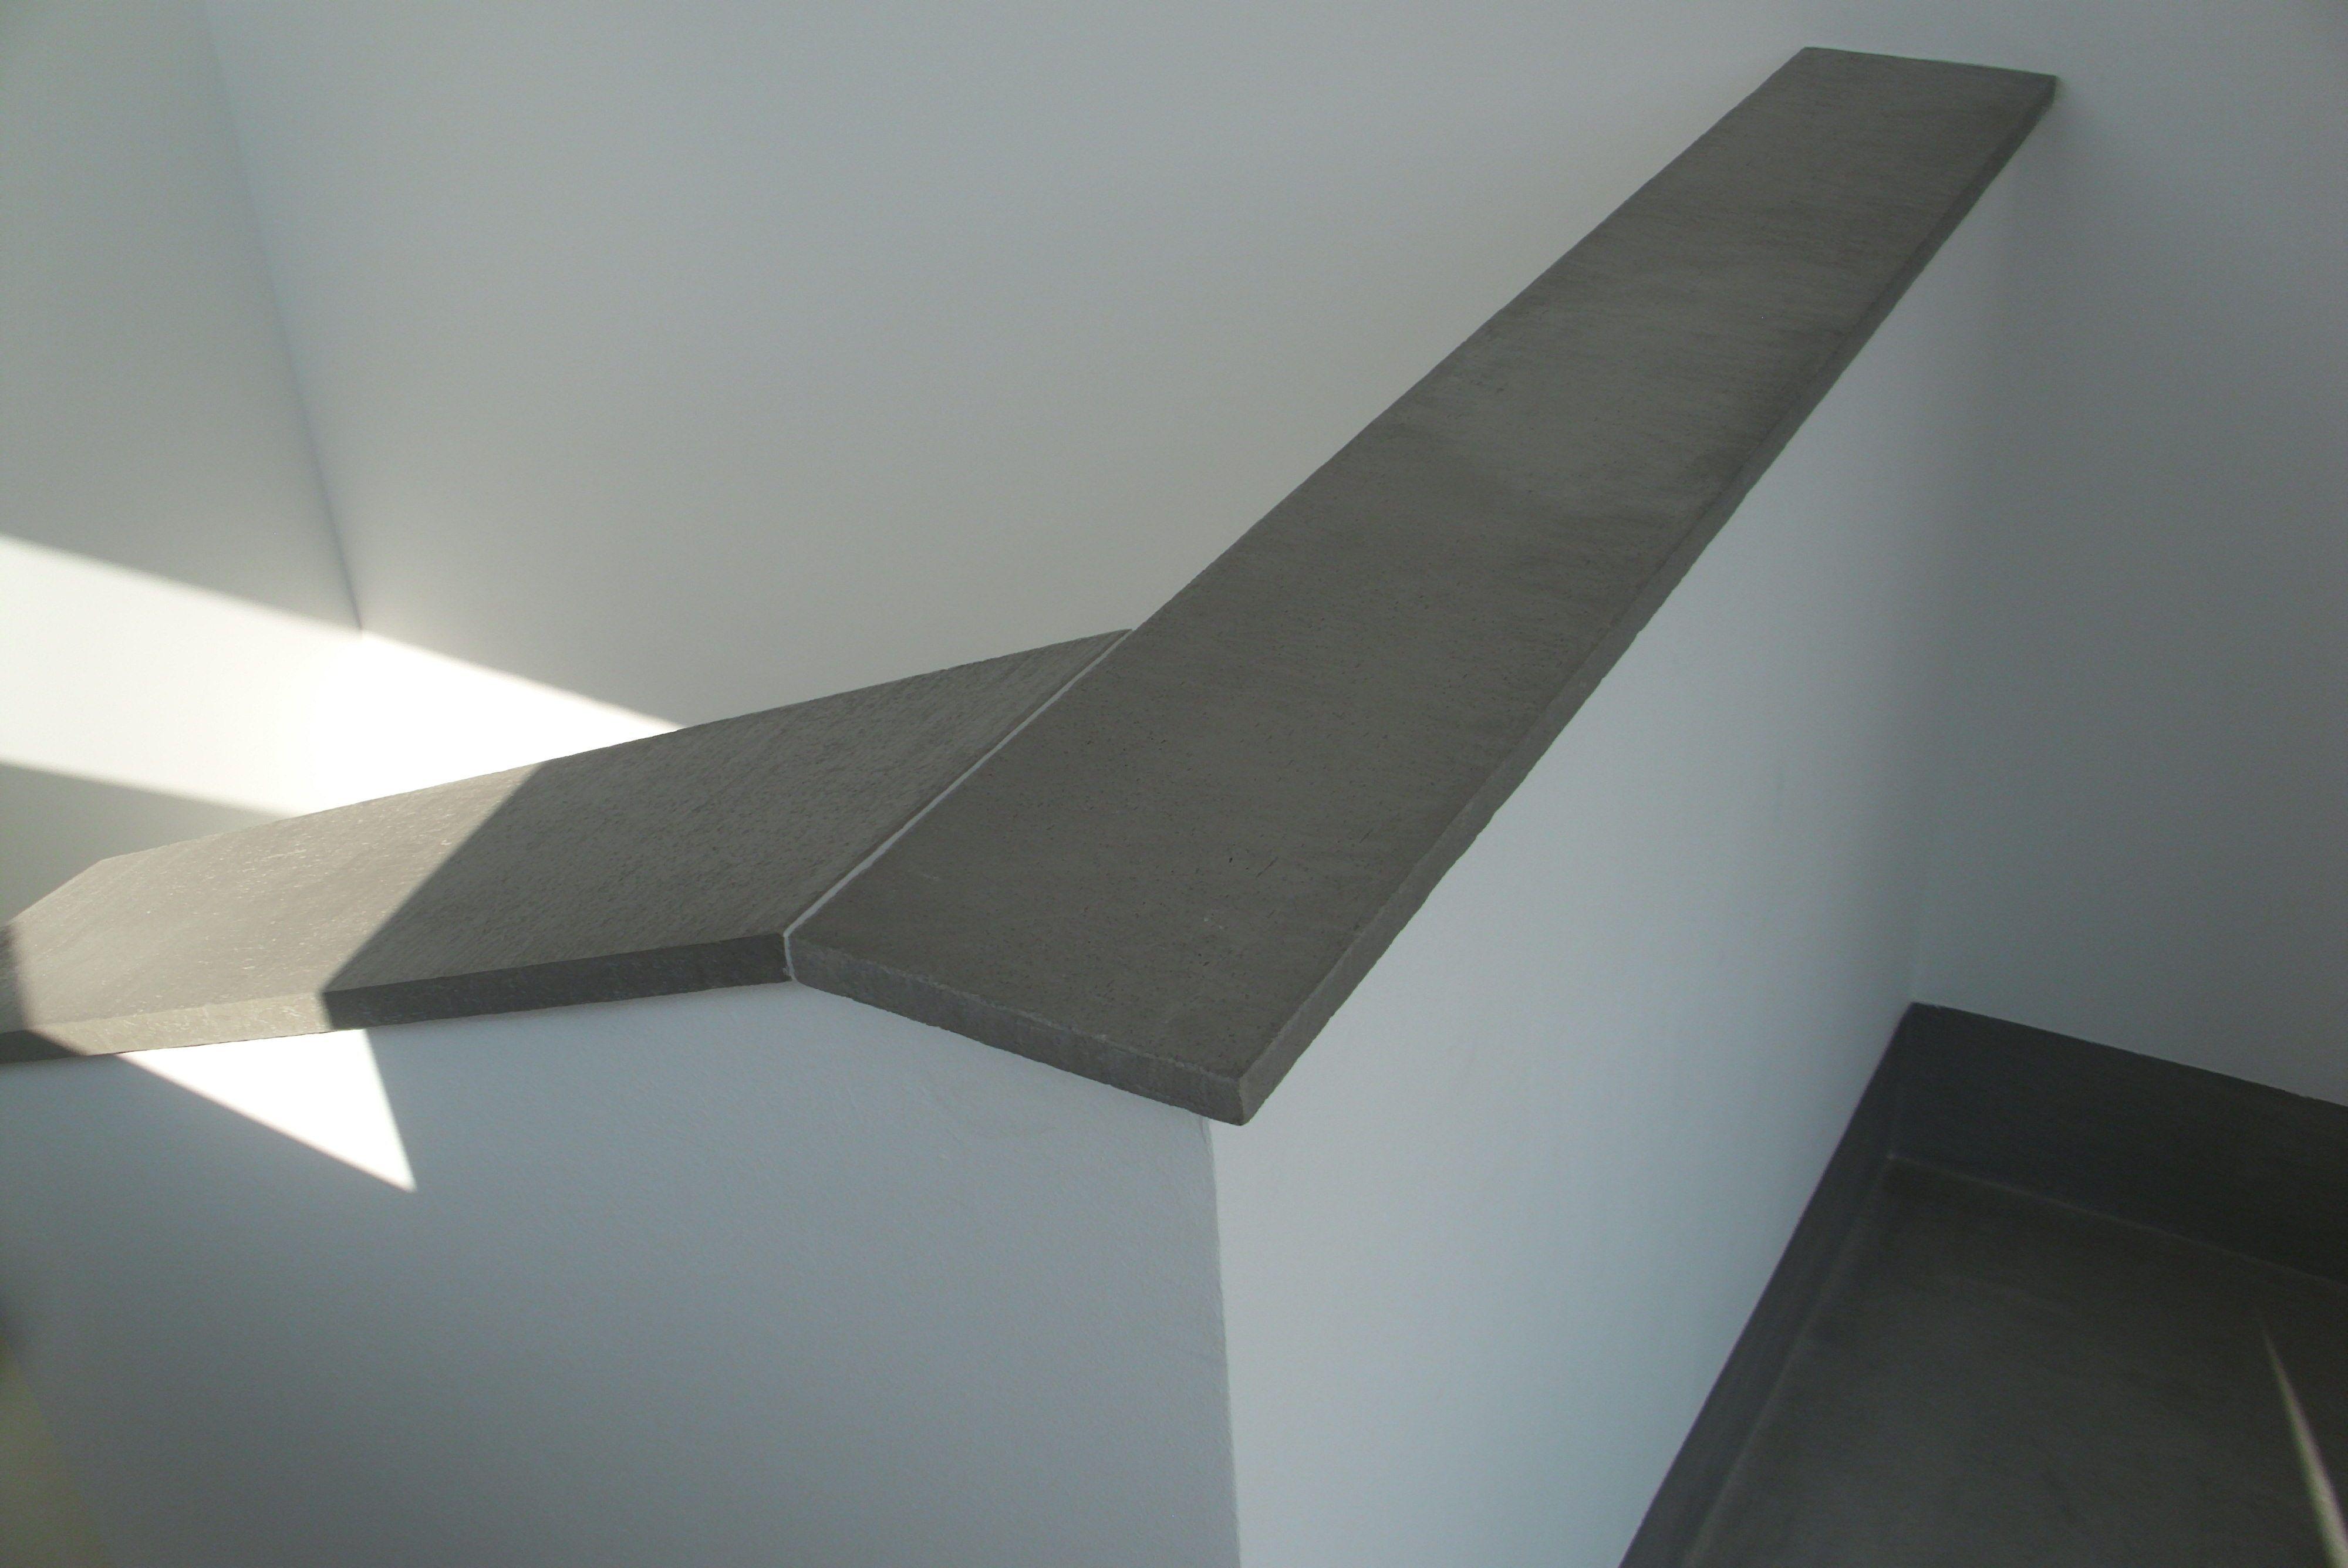 fensterbank beton look betonoptik betonoptik pinterest betonoptik fensterb nke und. Black Bedroom Furniture Sets. Home Design Ideas